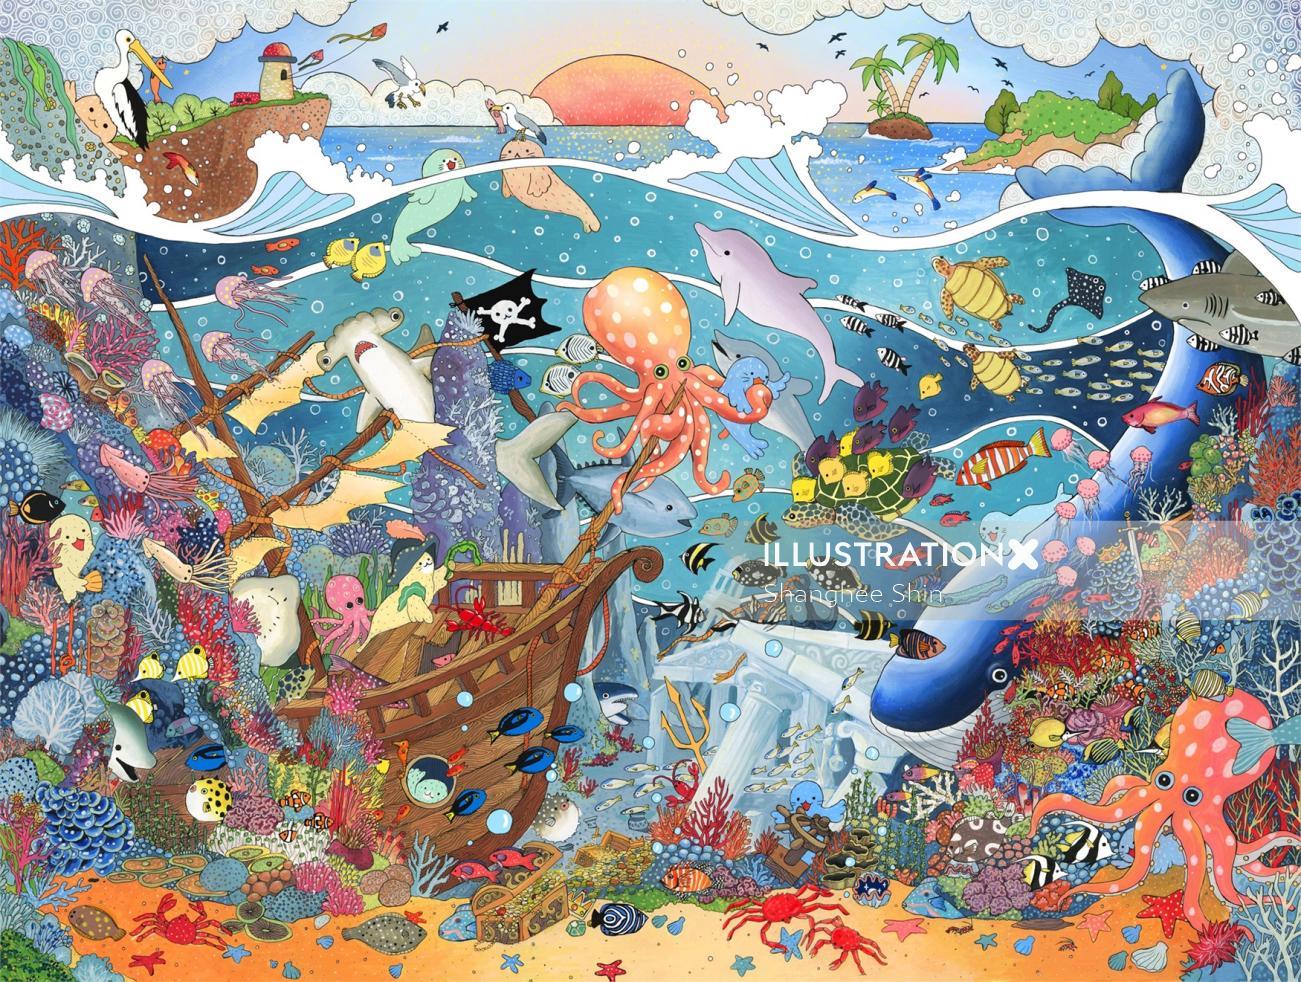 An illustration of underwater